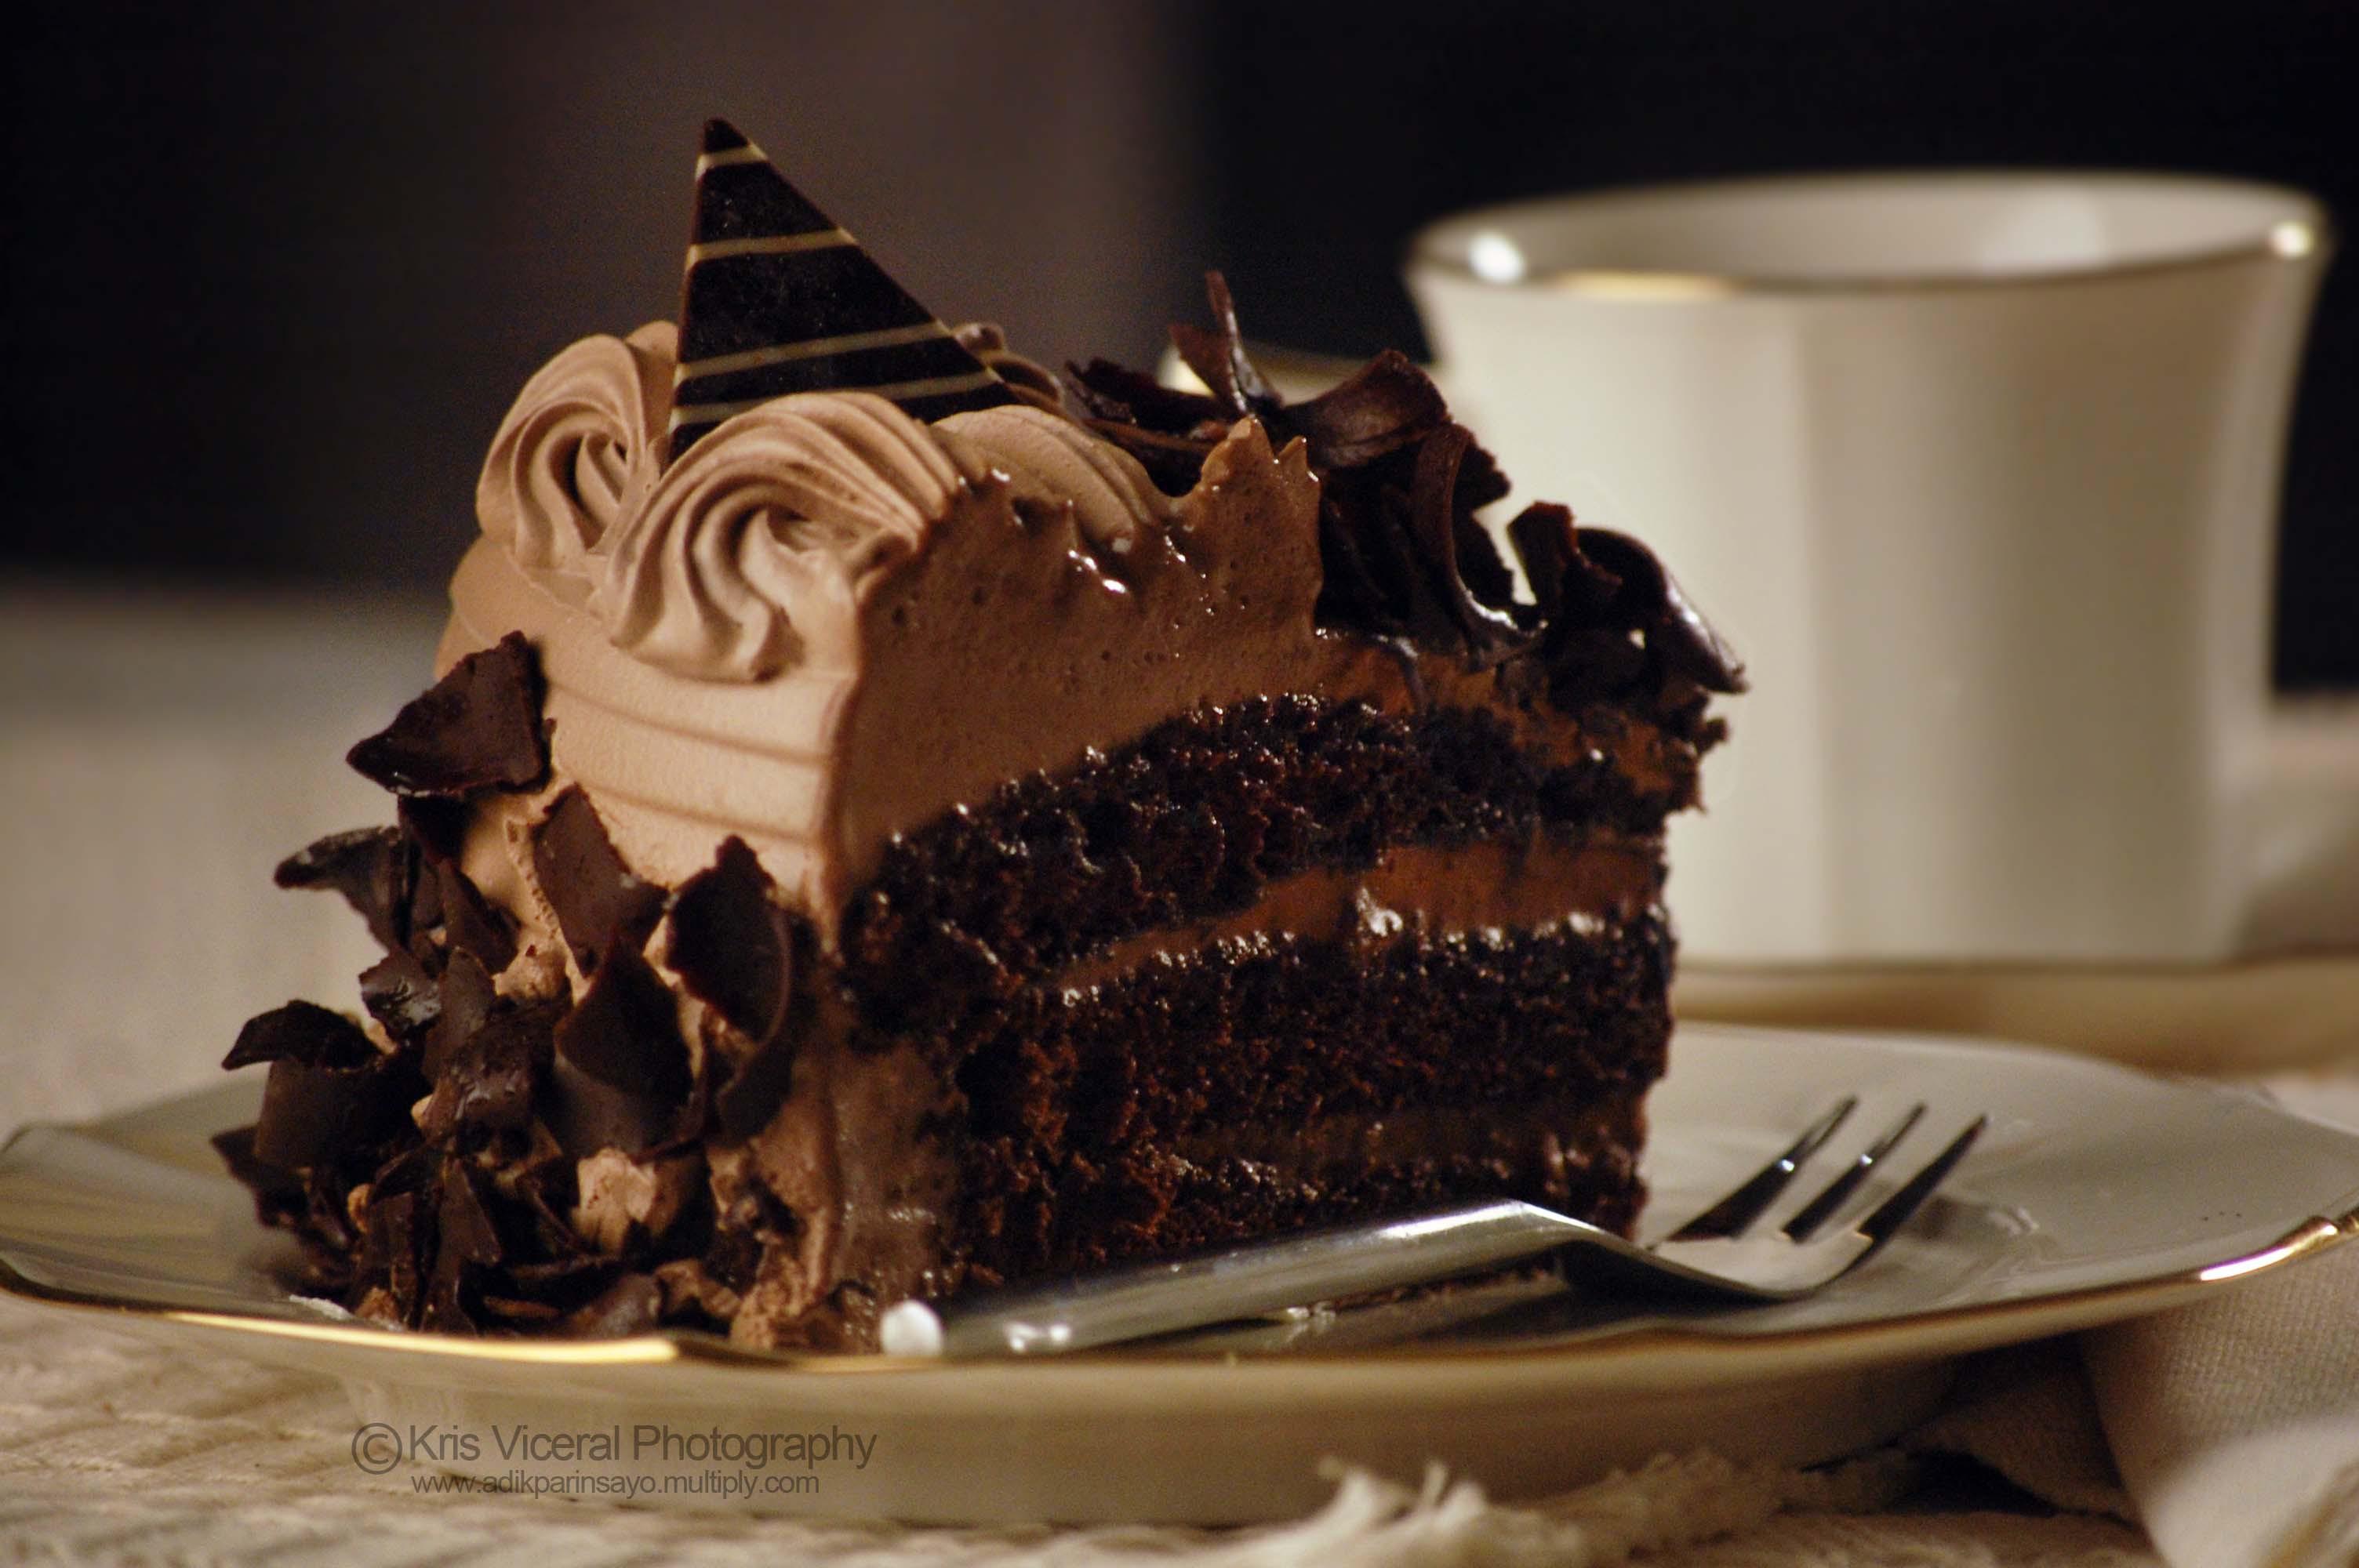 Preparation Of Delicious Chocolate Cake